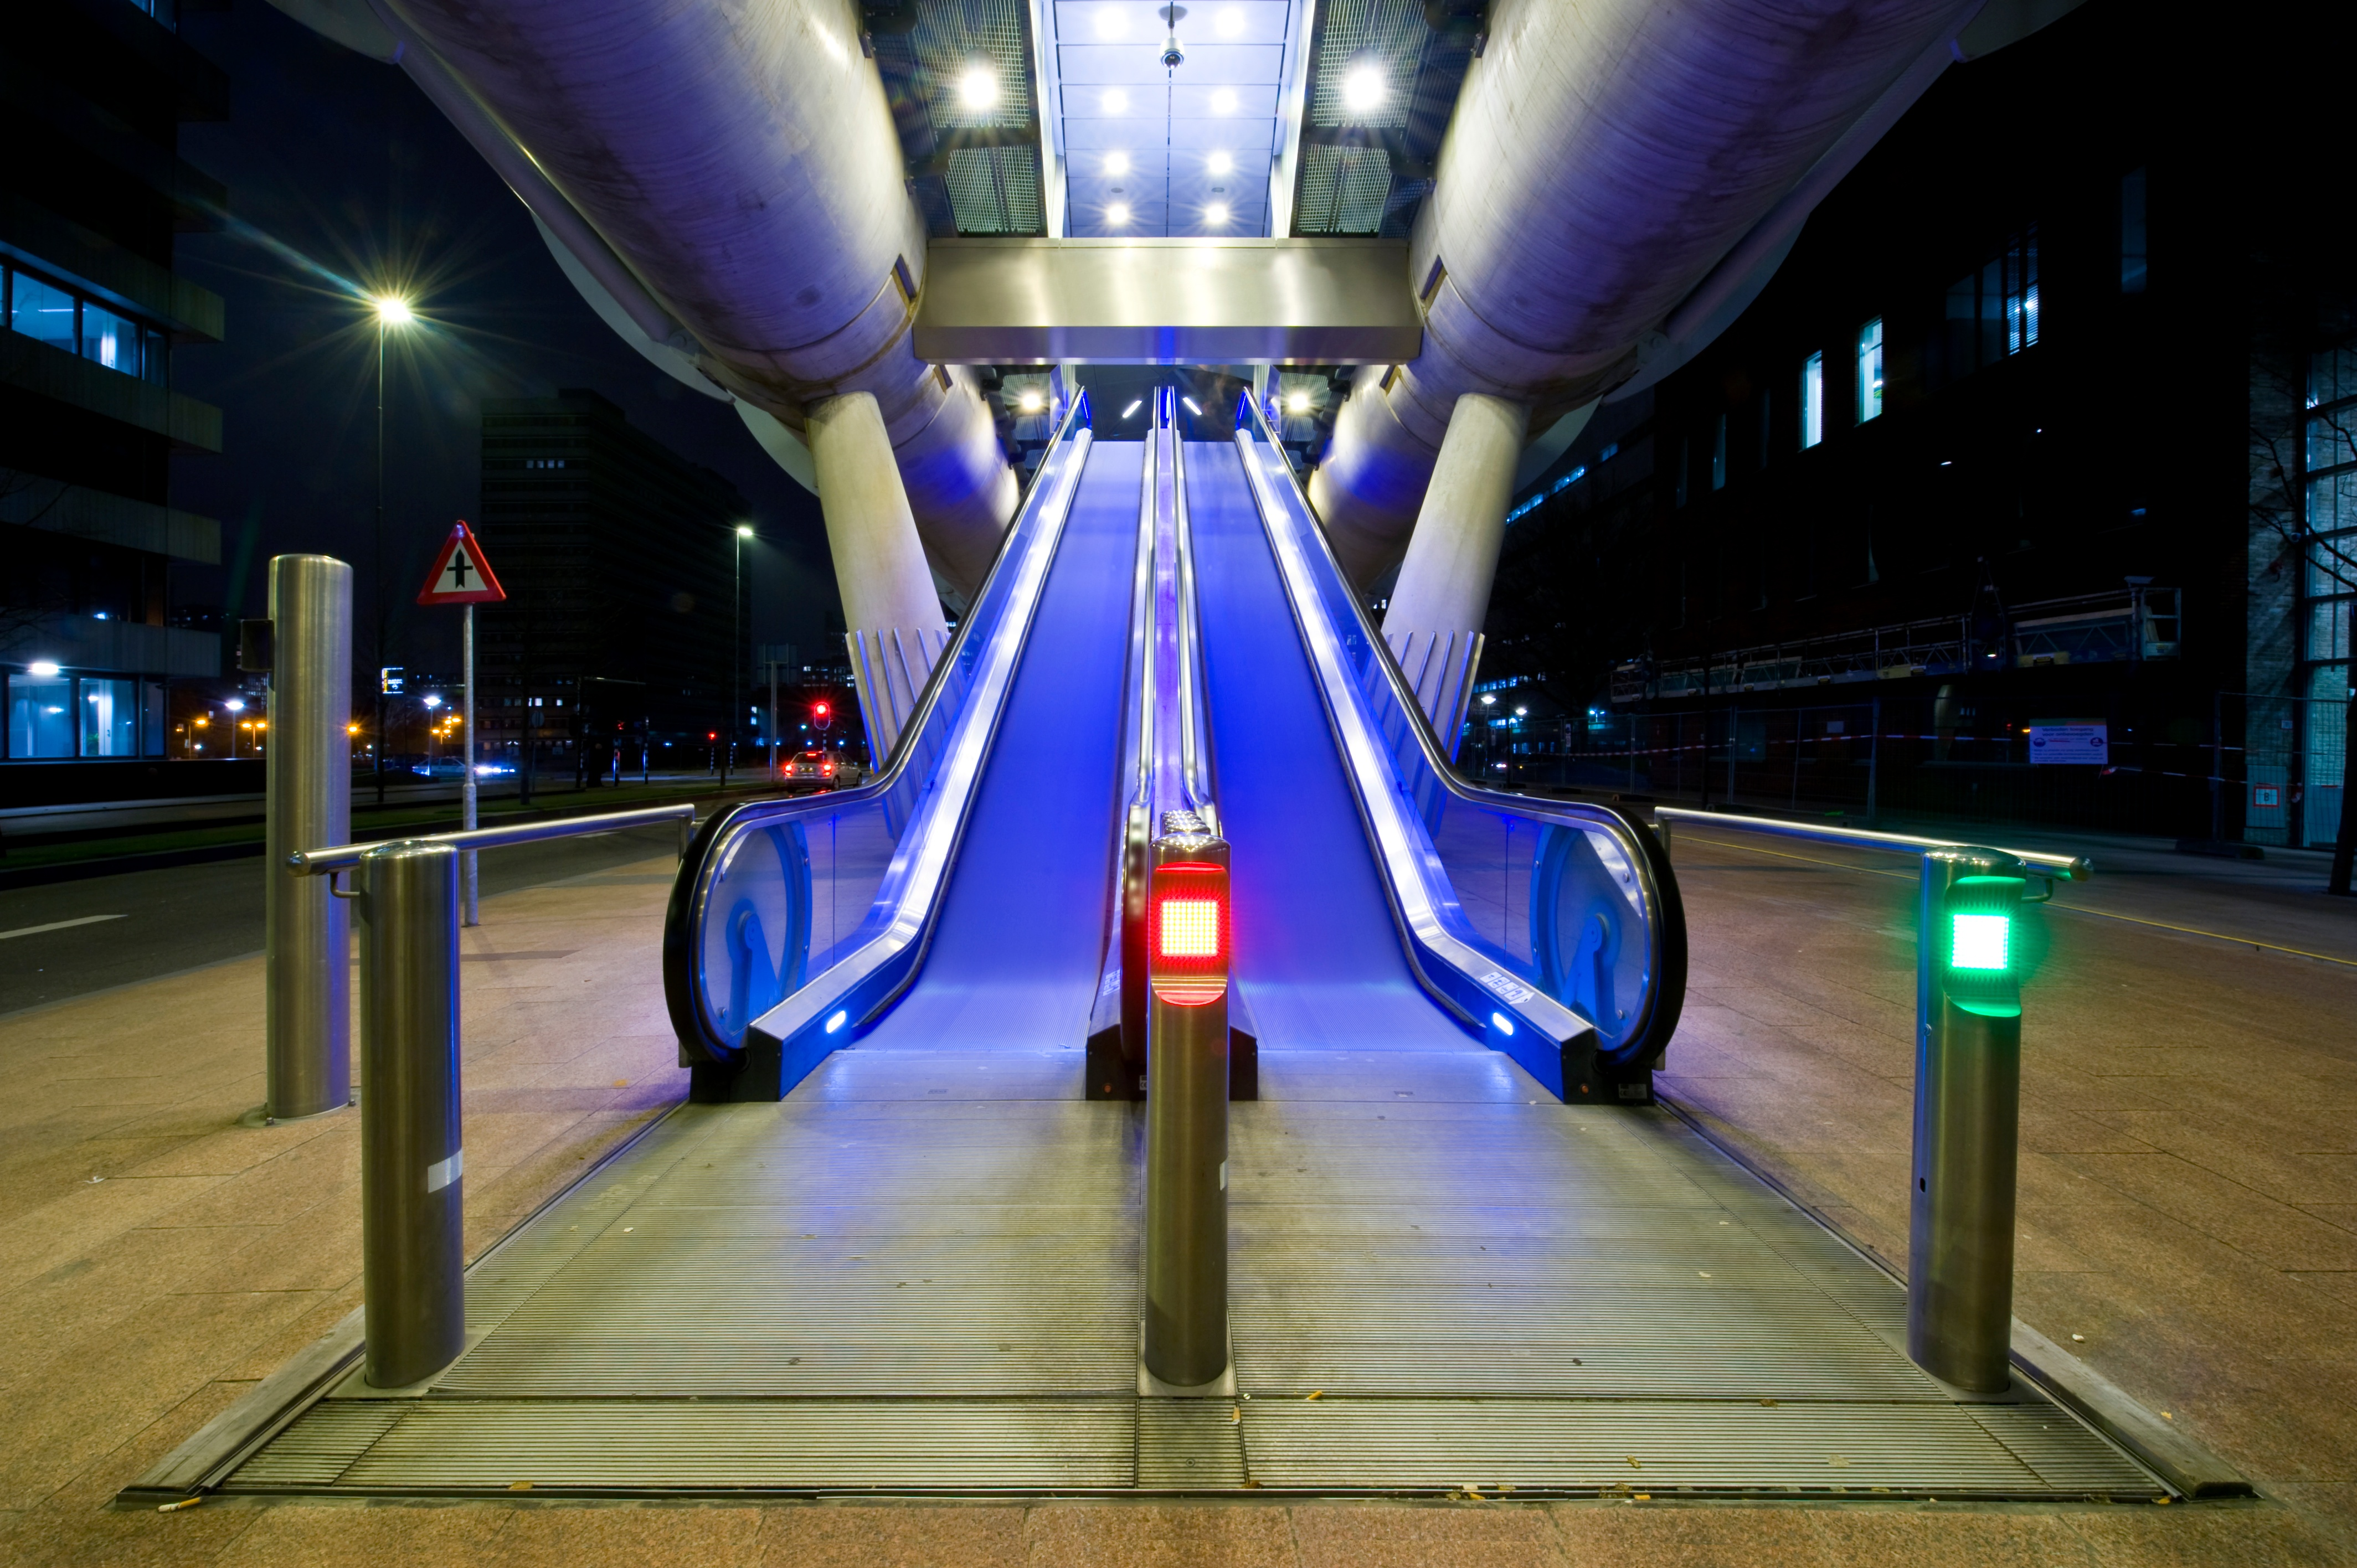 two escalators_red_green light